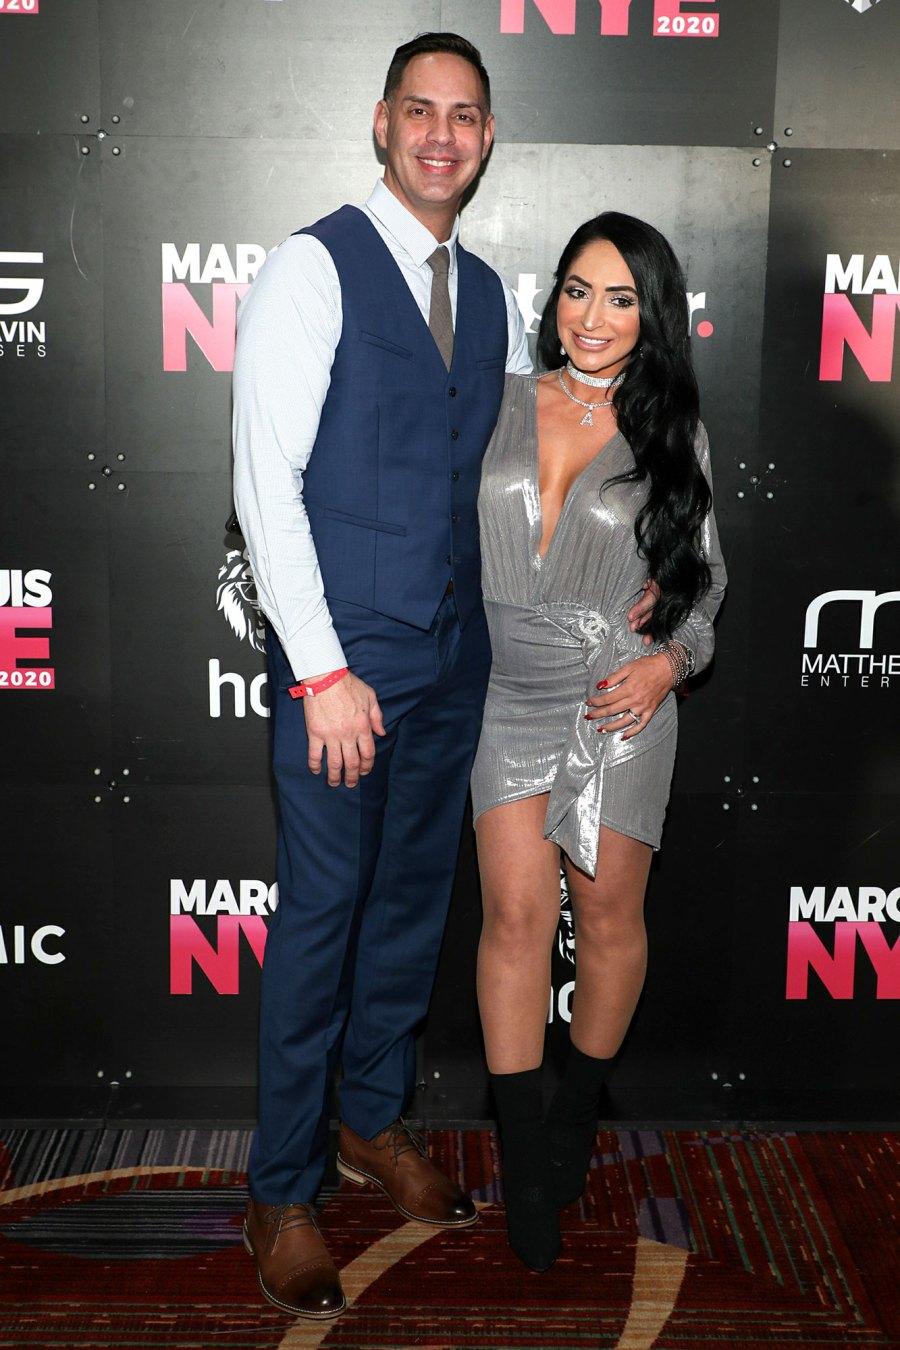 Feature Jersey Shore Angelina Pivarnick and Husband Chris Larangeira Ups and Downs